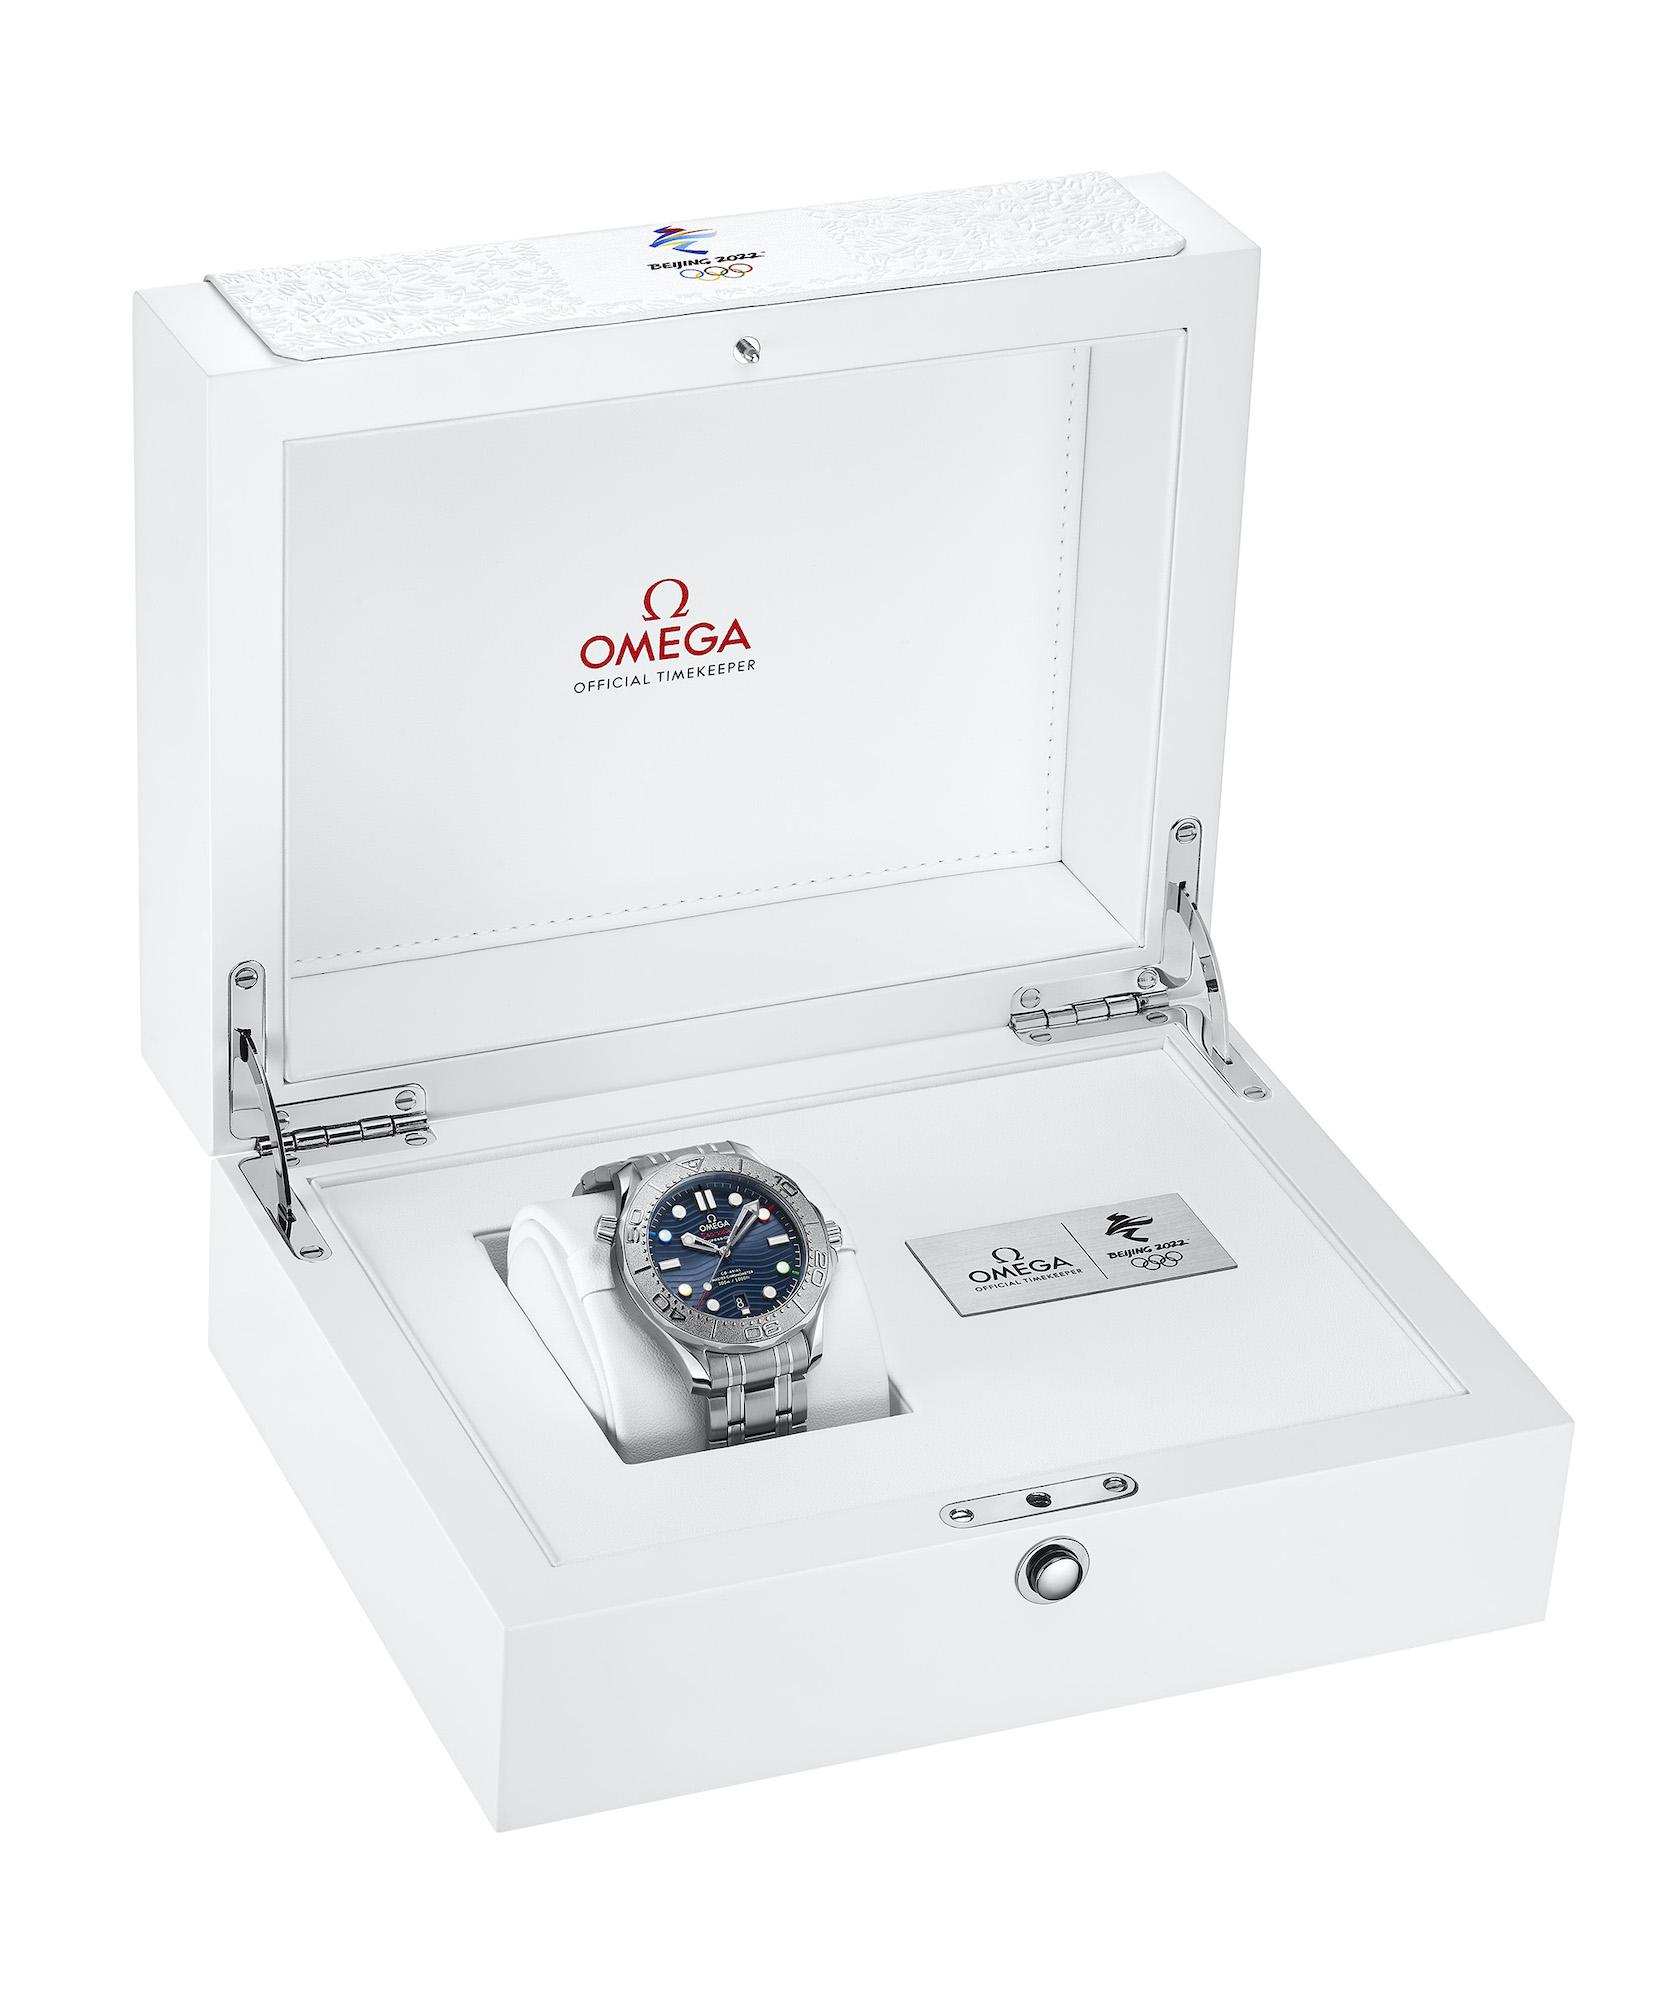 Omega Seamaster Diver 300M Beijing 2022 522.30.42.20.03.001 caja 2